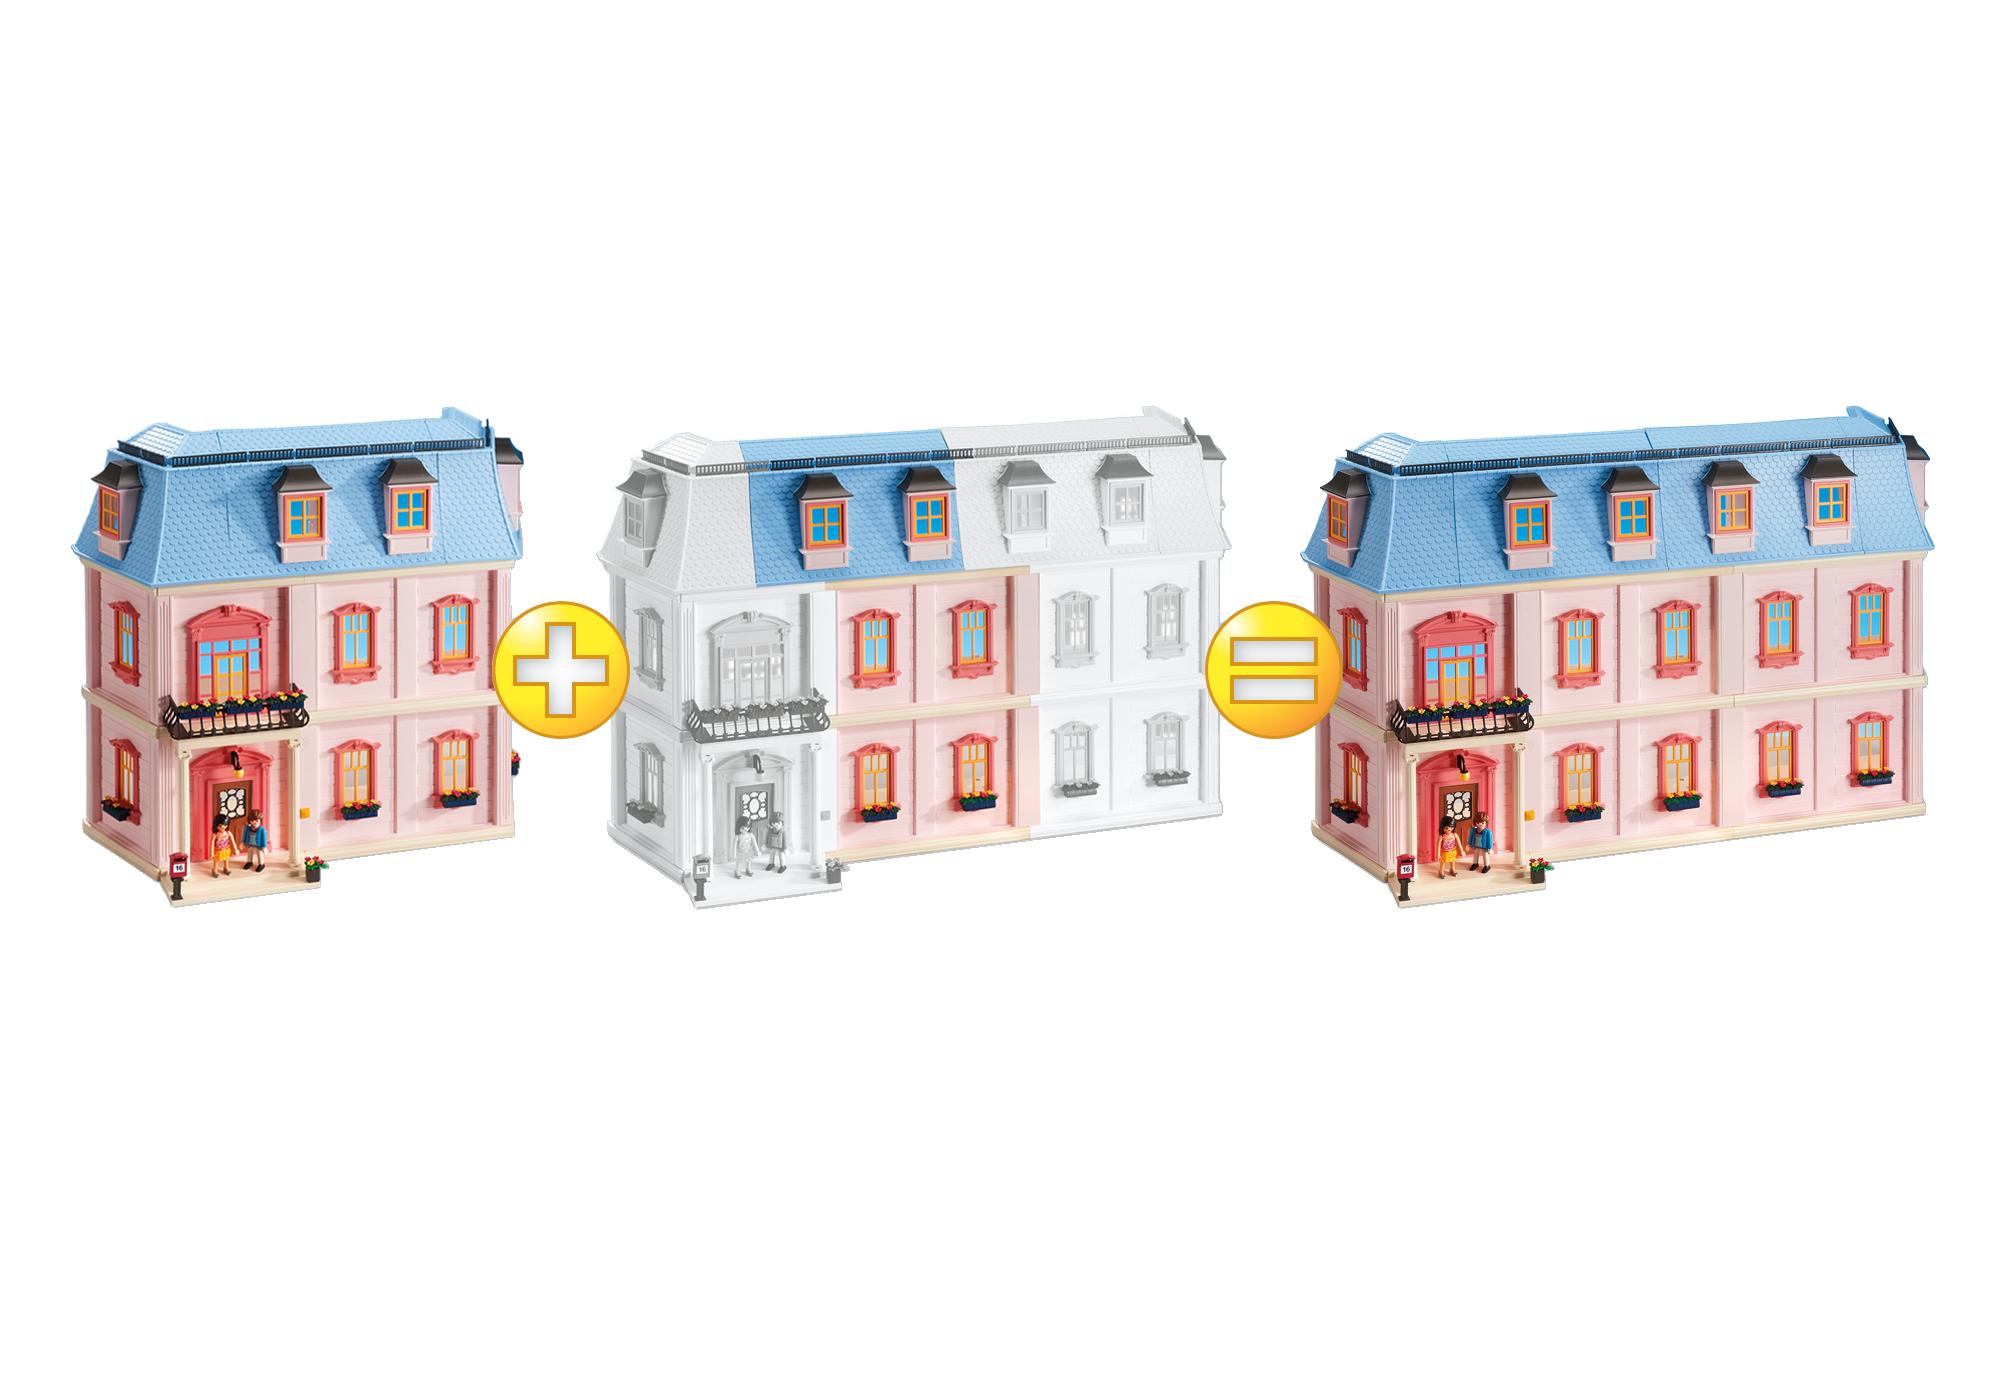 http://media.playmobil.com/i/playmobil/6452_product_extra1/Uitbreidingsset A voor Herenhuis